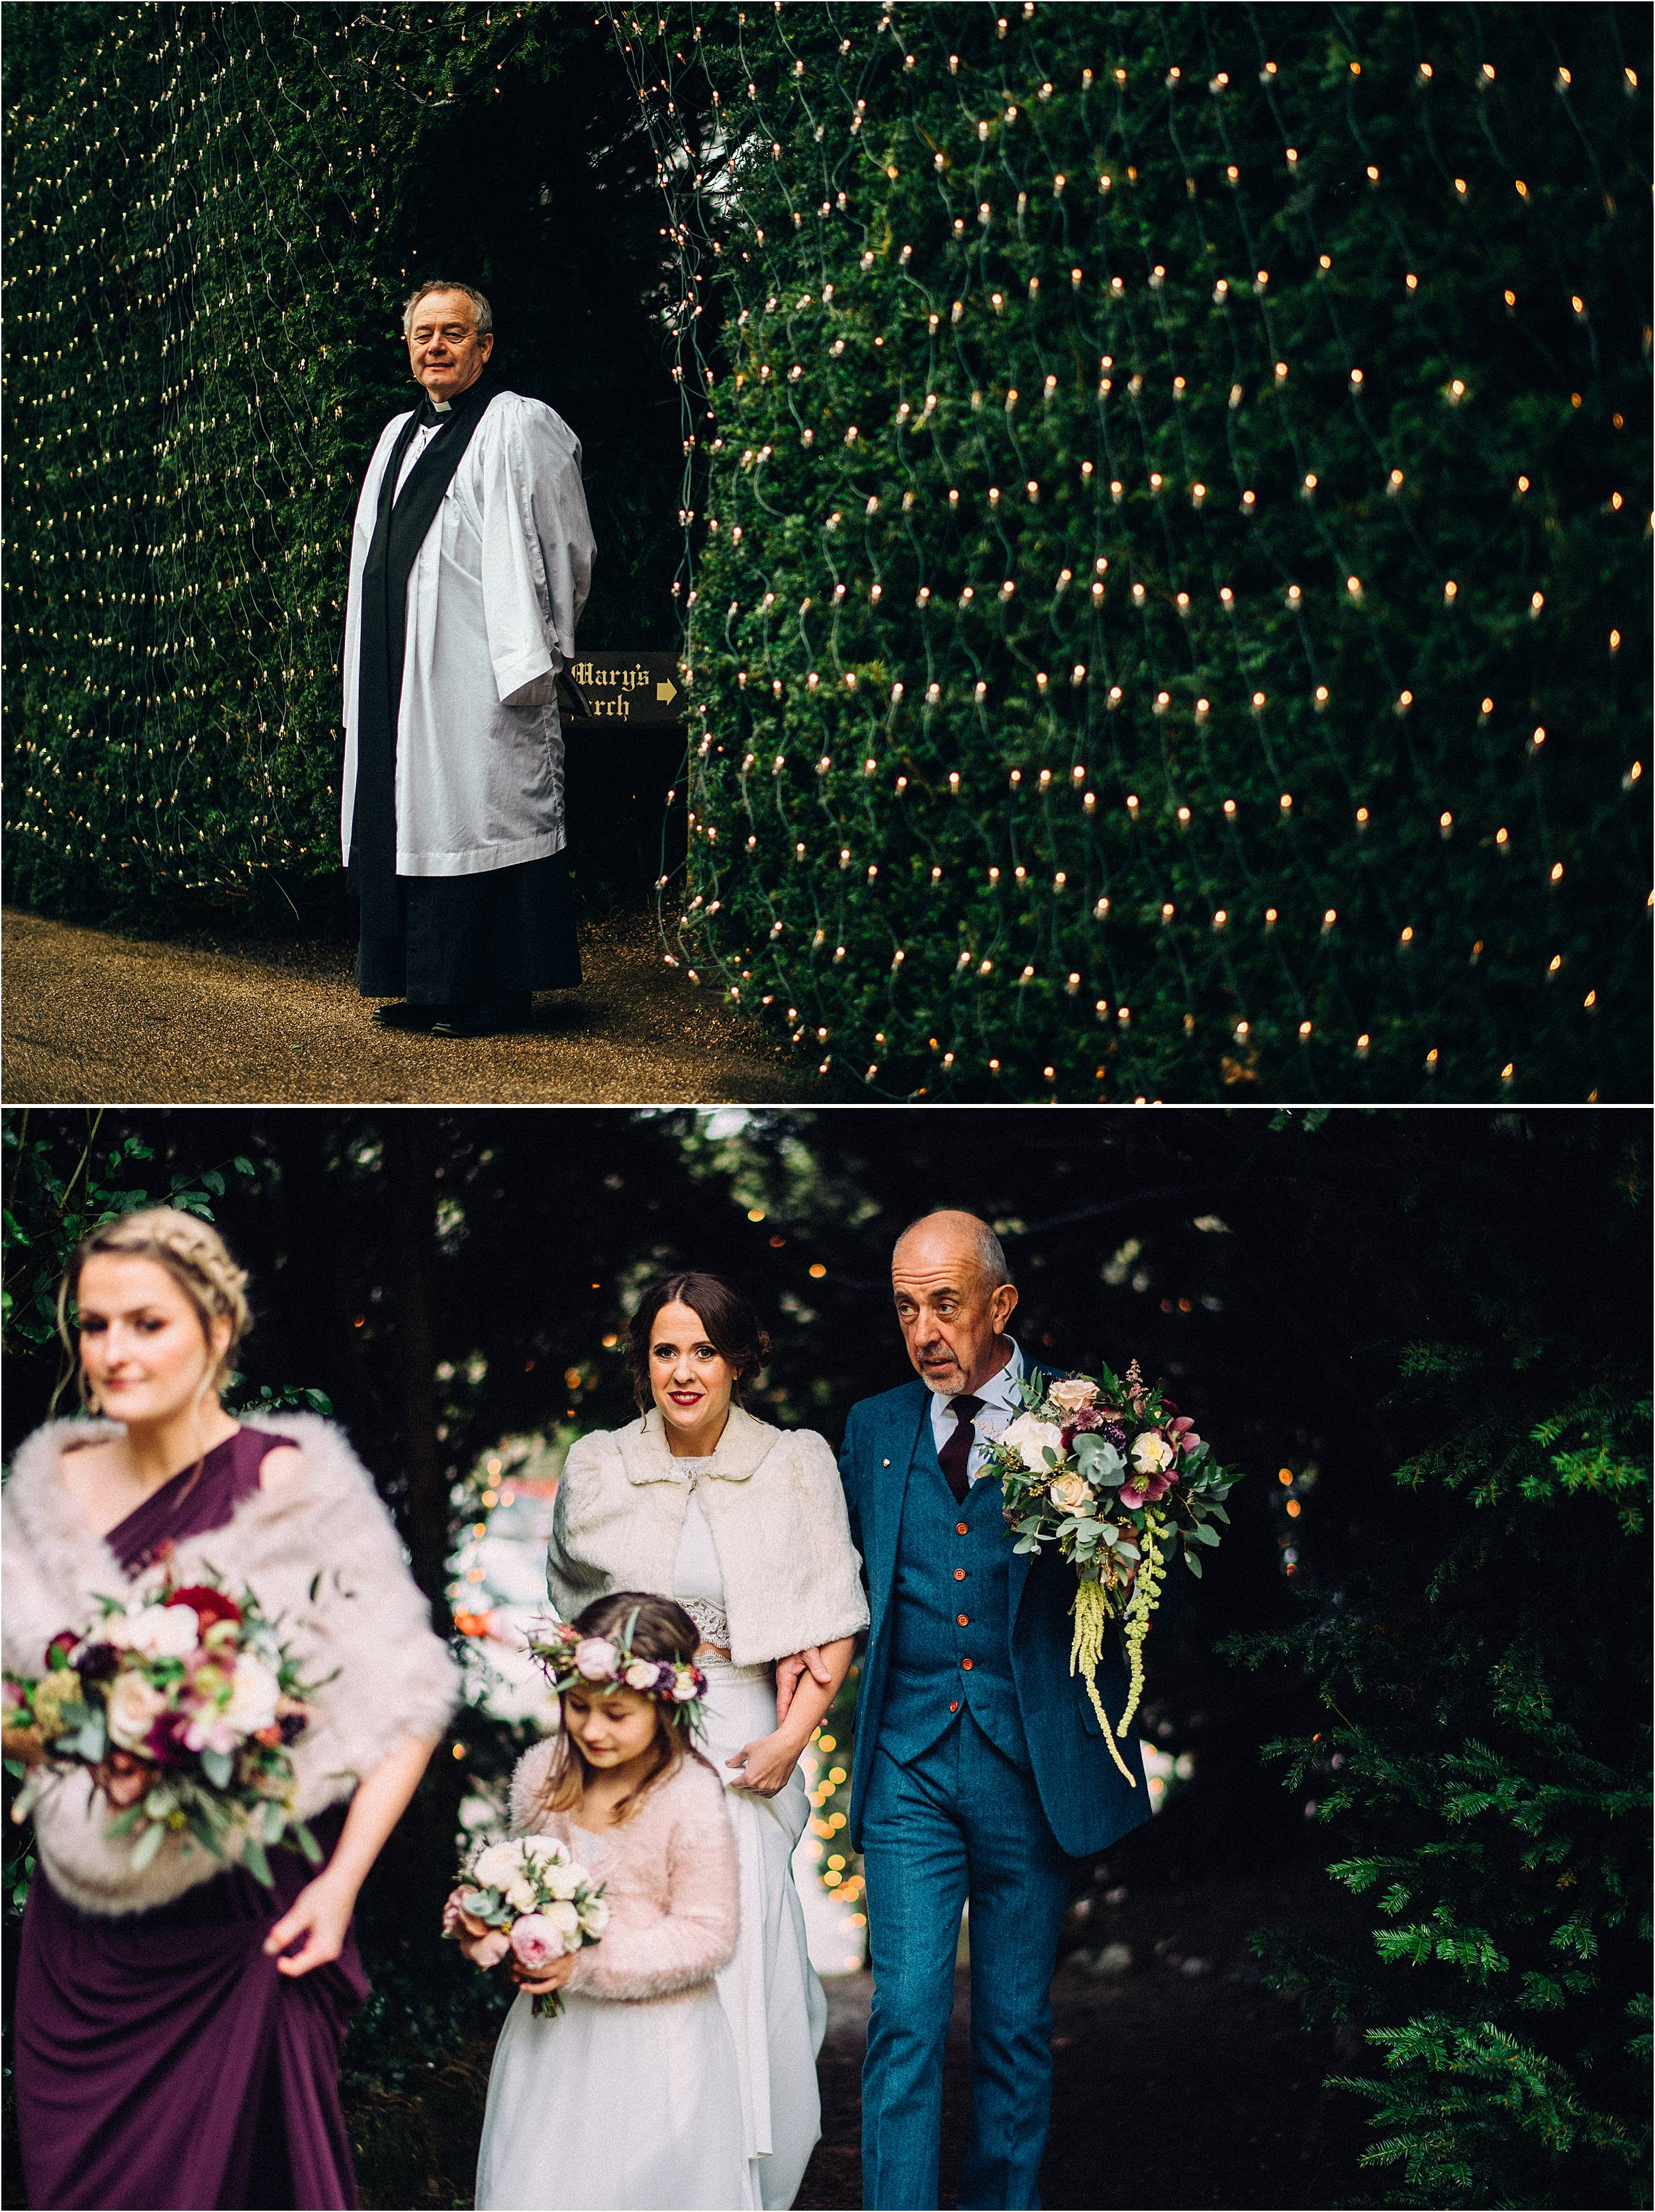 Cowley Manor Cotswolds Wedding Photographer_0046.jpg